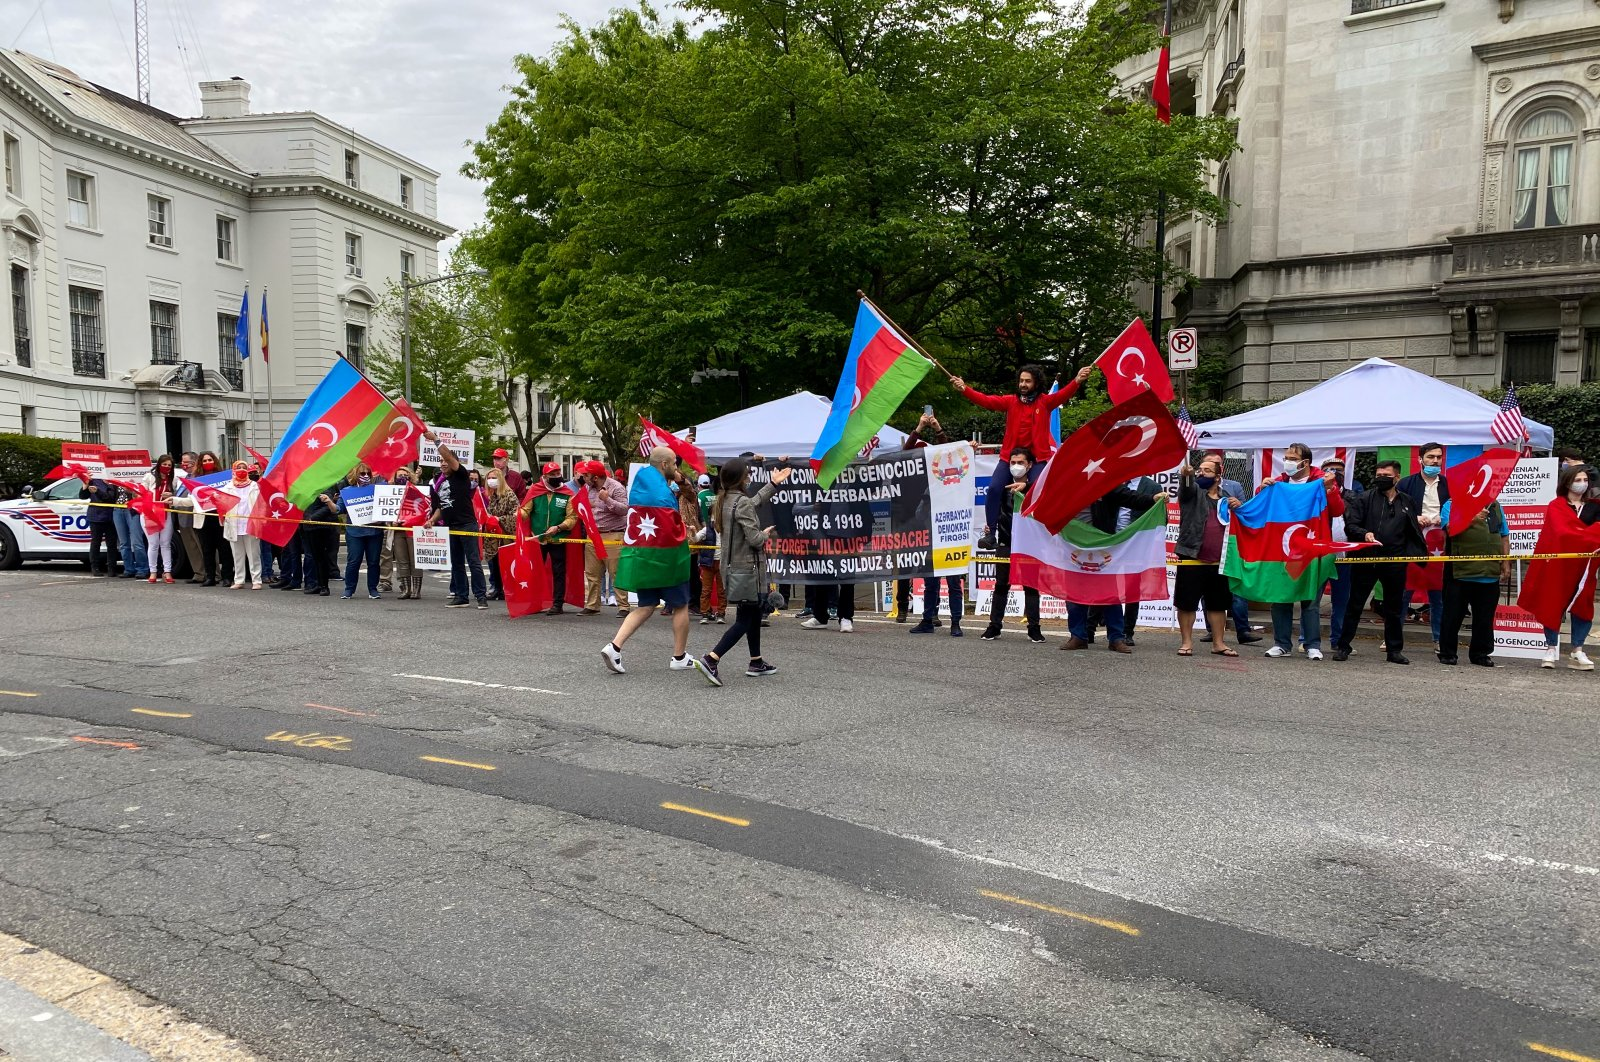 Turks in Washington protest U.S. President Joe Biden's decision to recognize 1915 events as genocide, Washington, U.S., April 24, 2021. (AA)